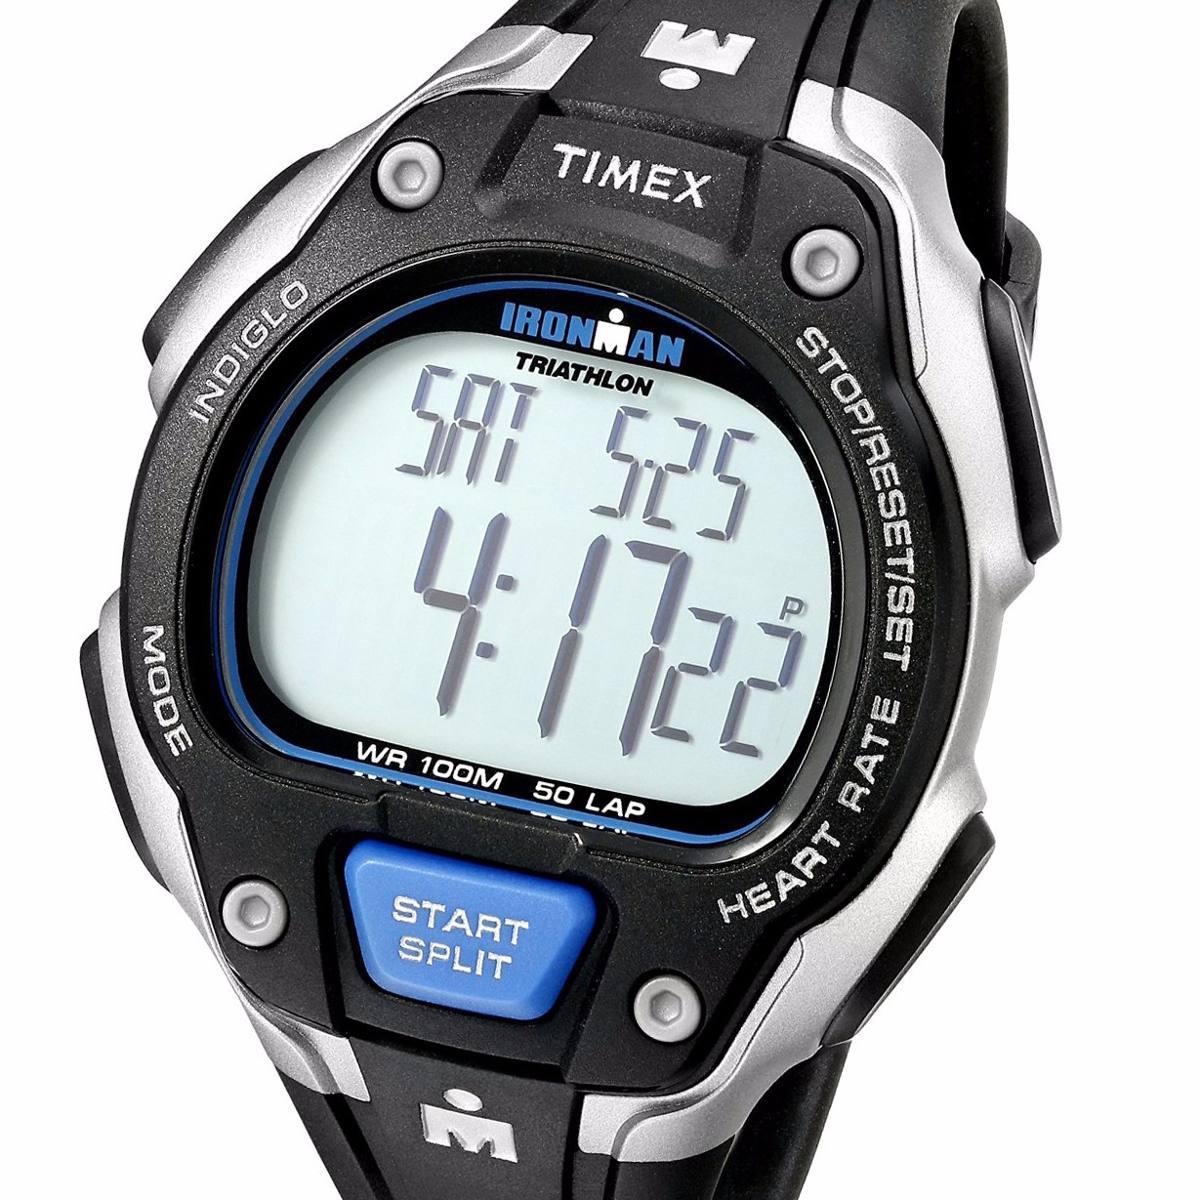 ba866db8b632 reloj timex t5k718 pulsometro iroman trainer cronoo 50 lap. Cargando zoom.